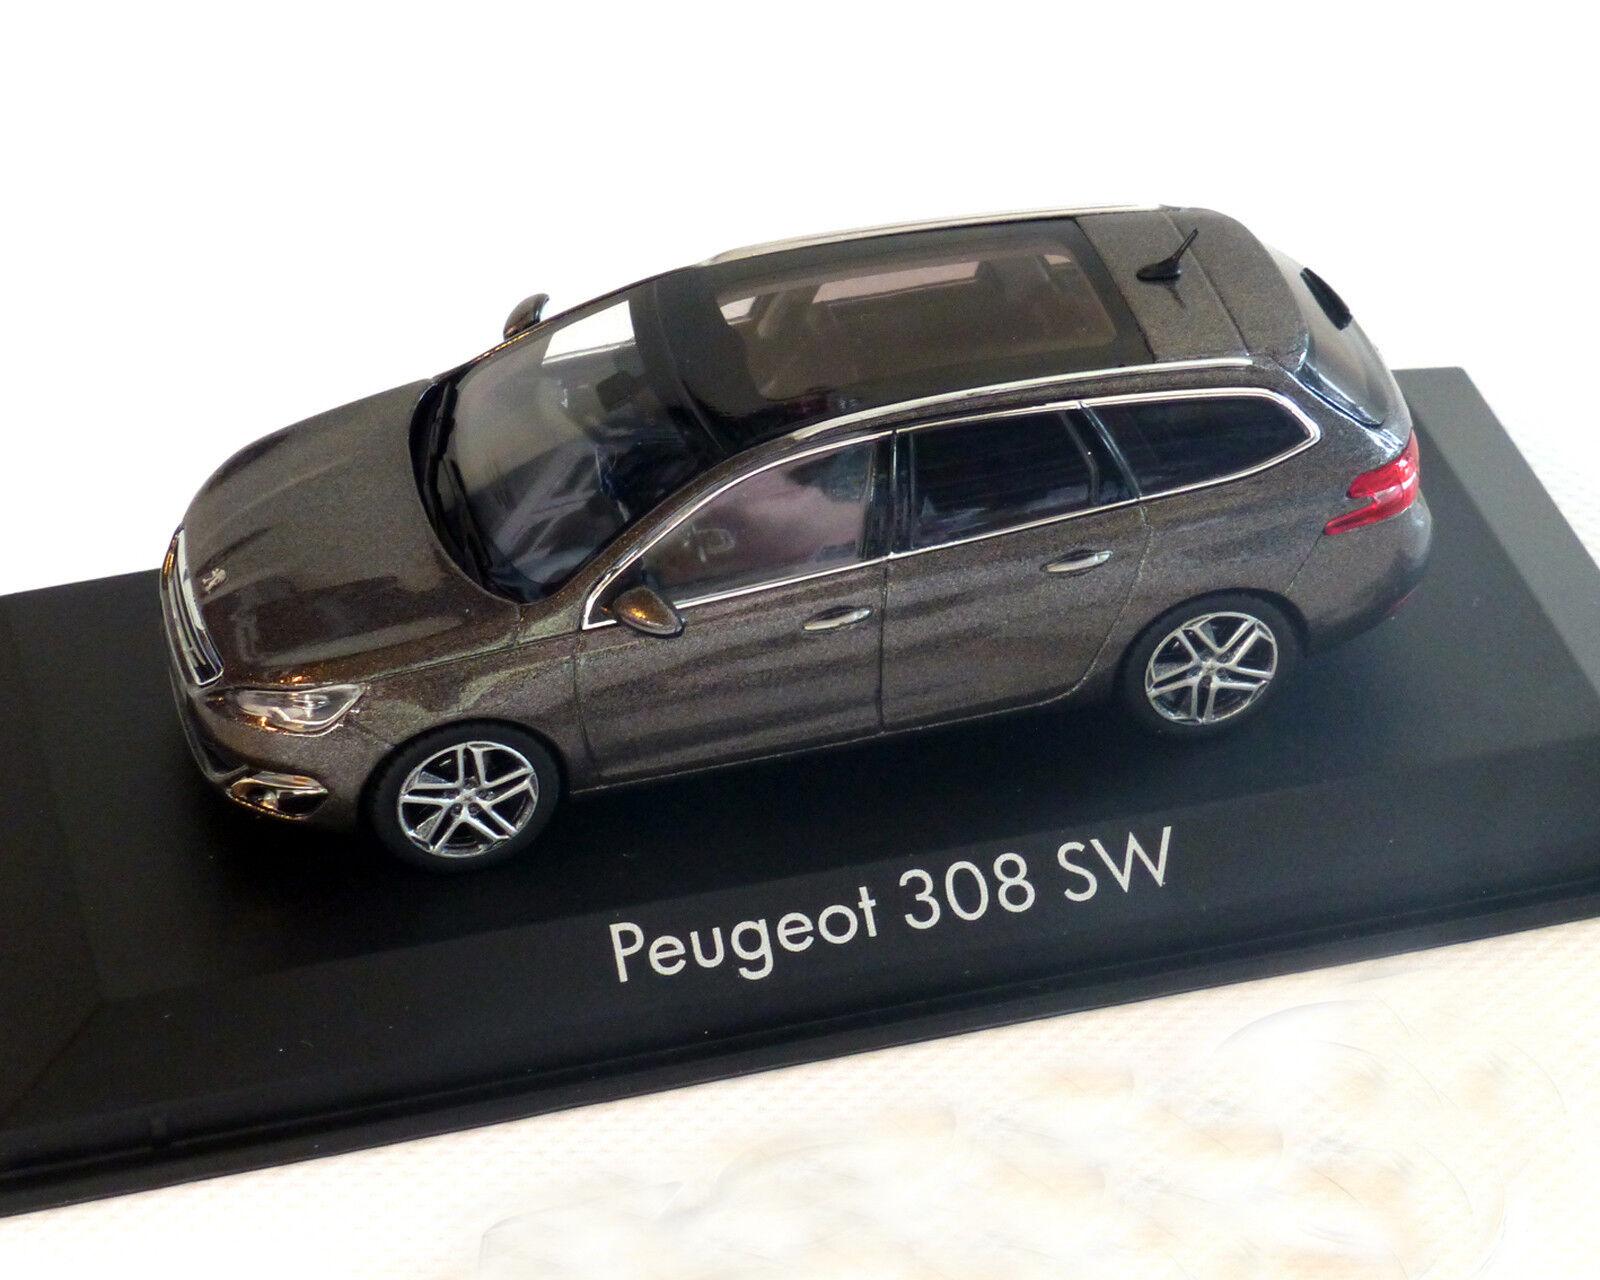 Peugeot 308 SW moca-gris-metalizado, 1 43 norev